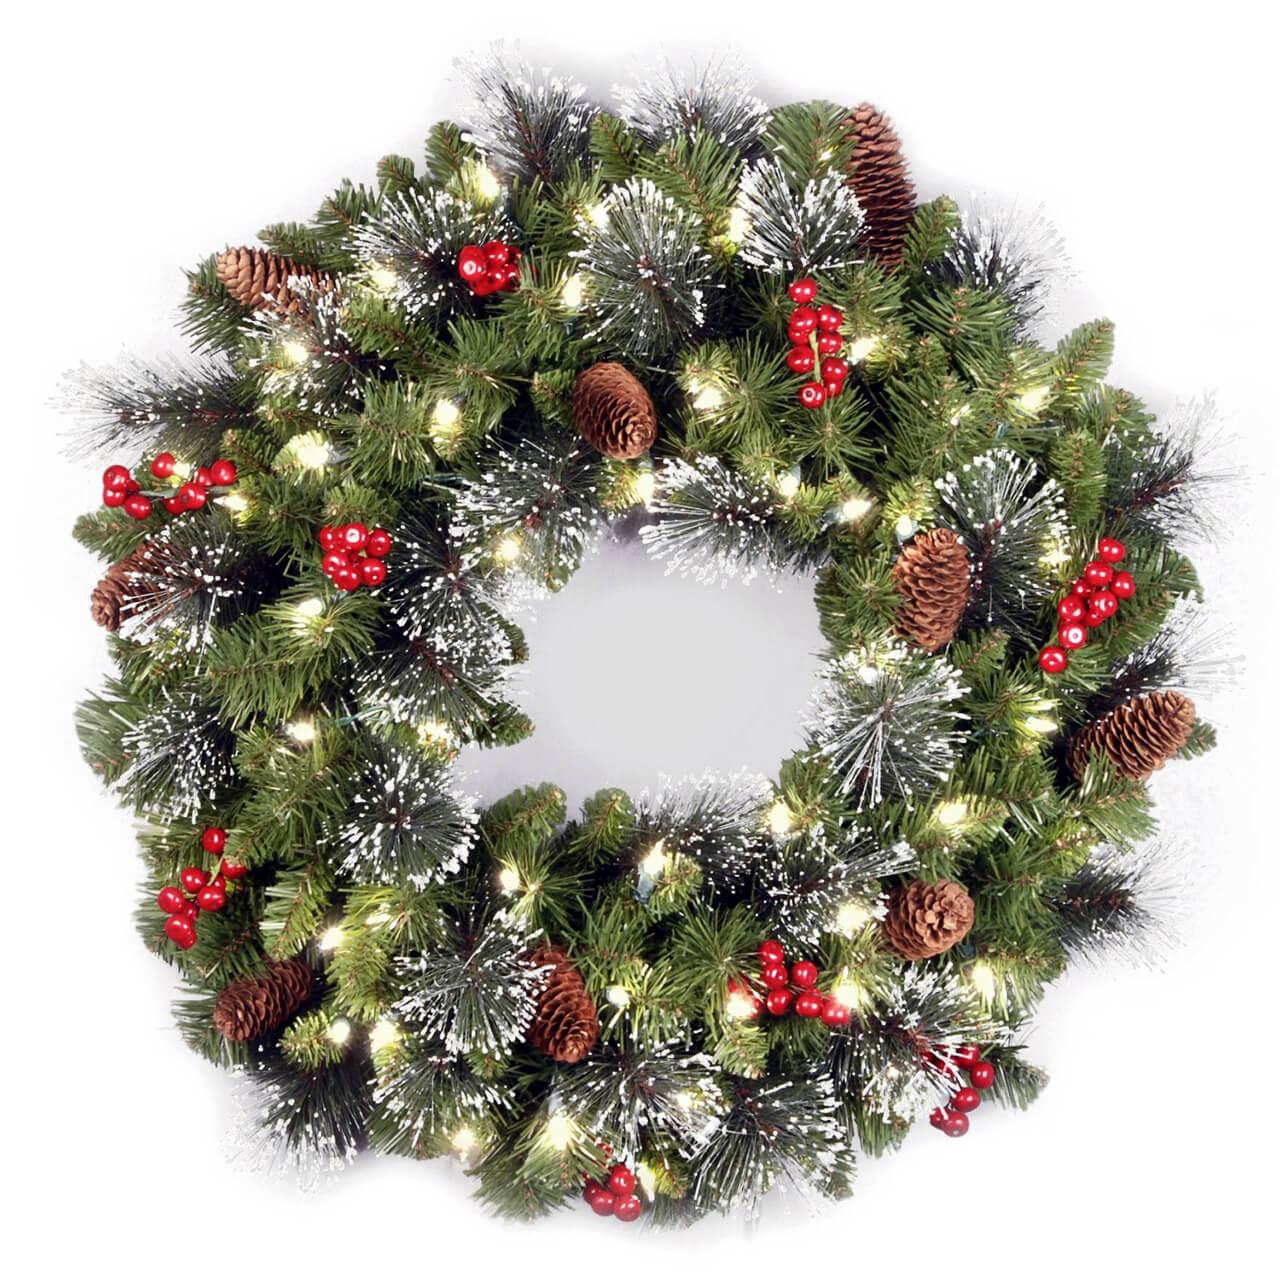 A Really Resplendent Wreath